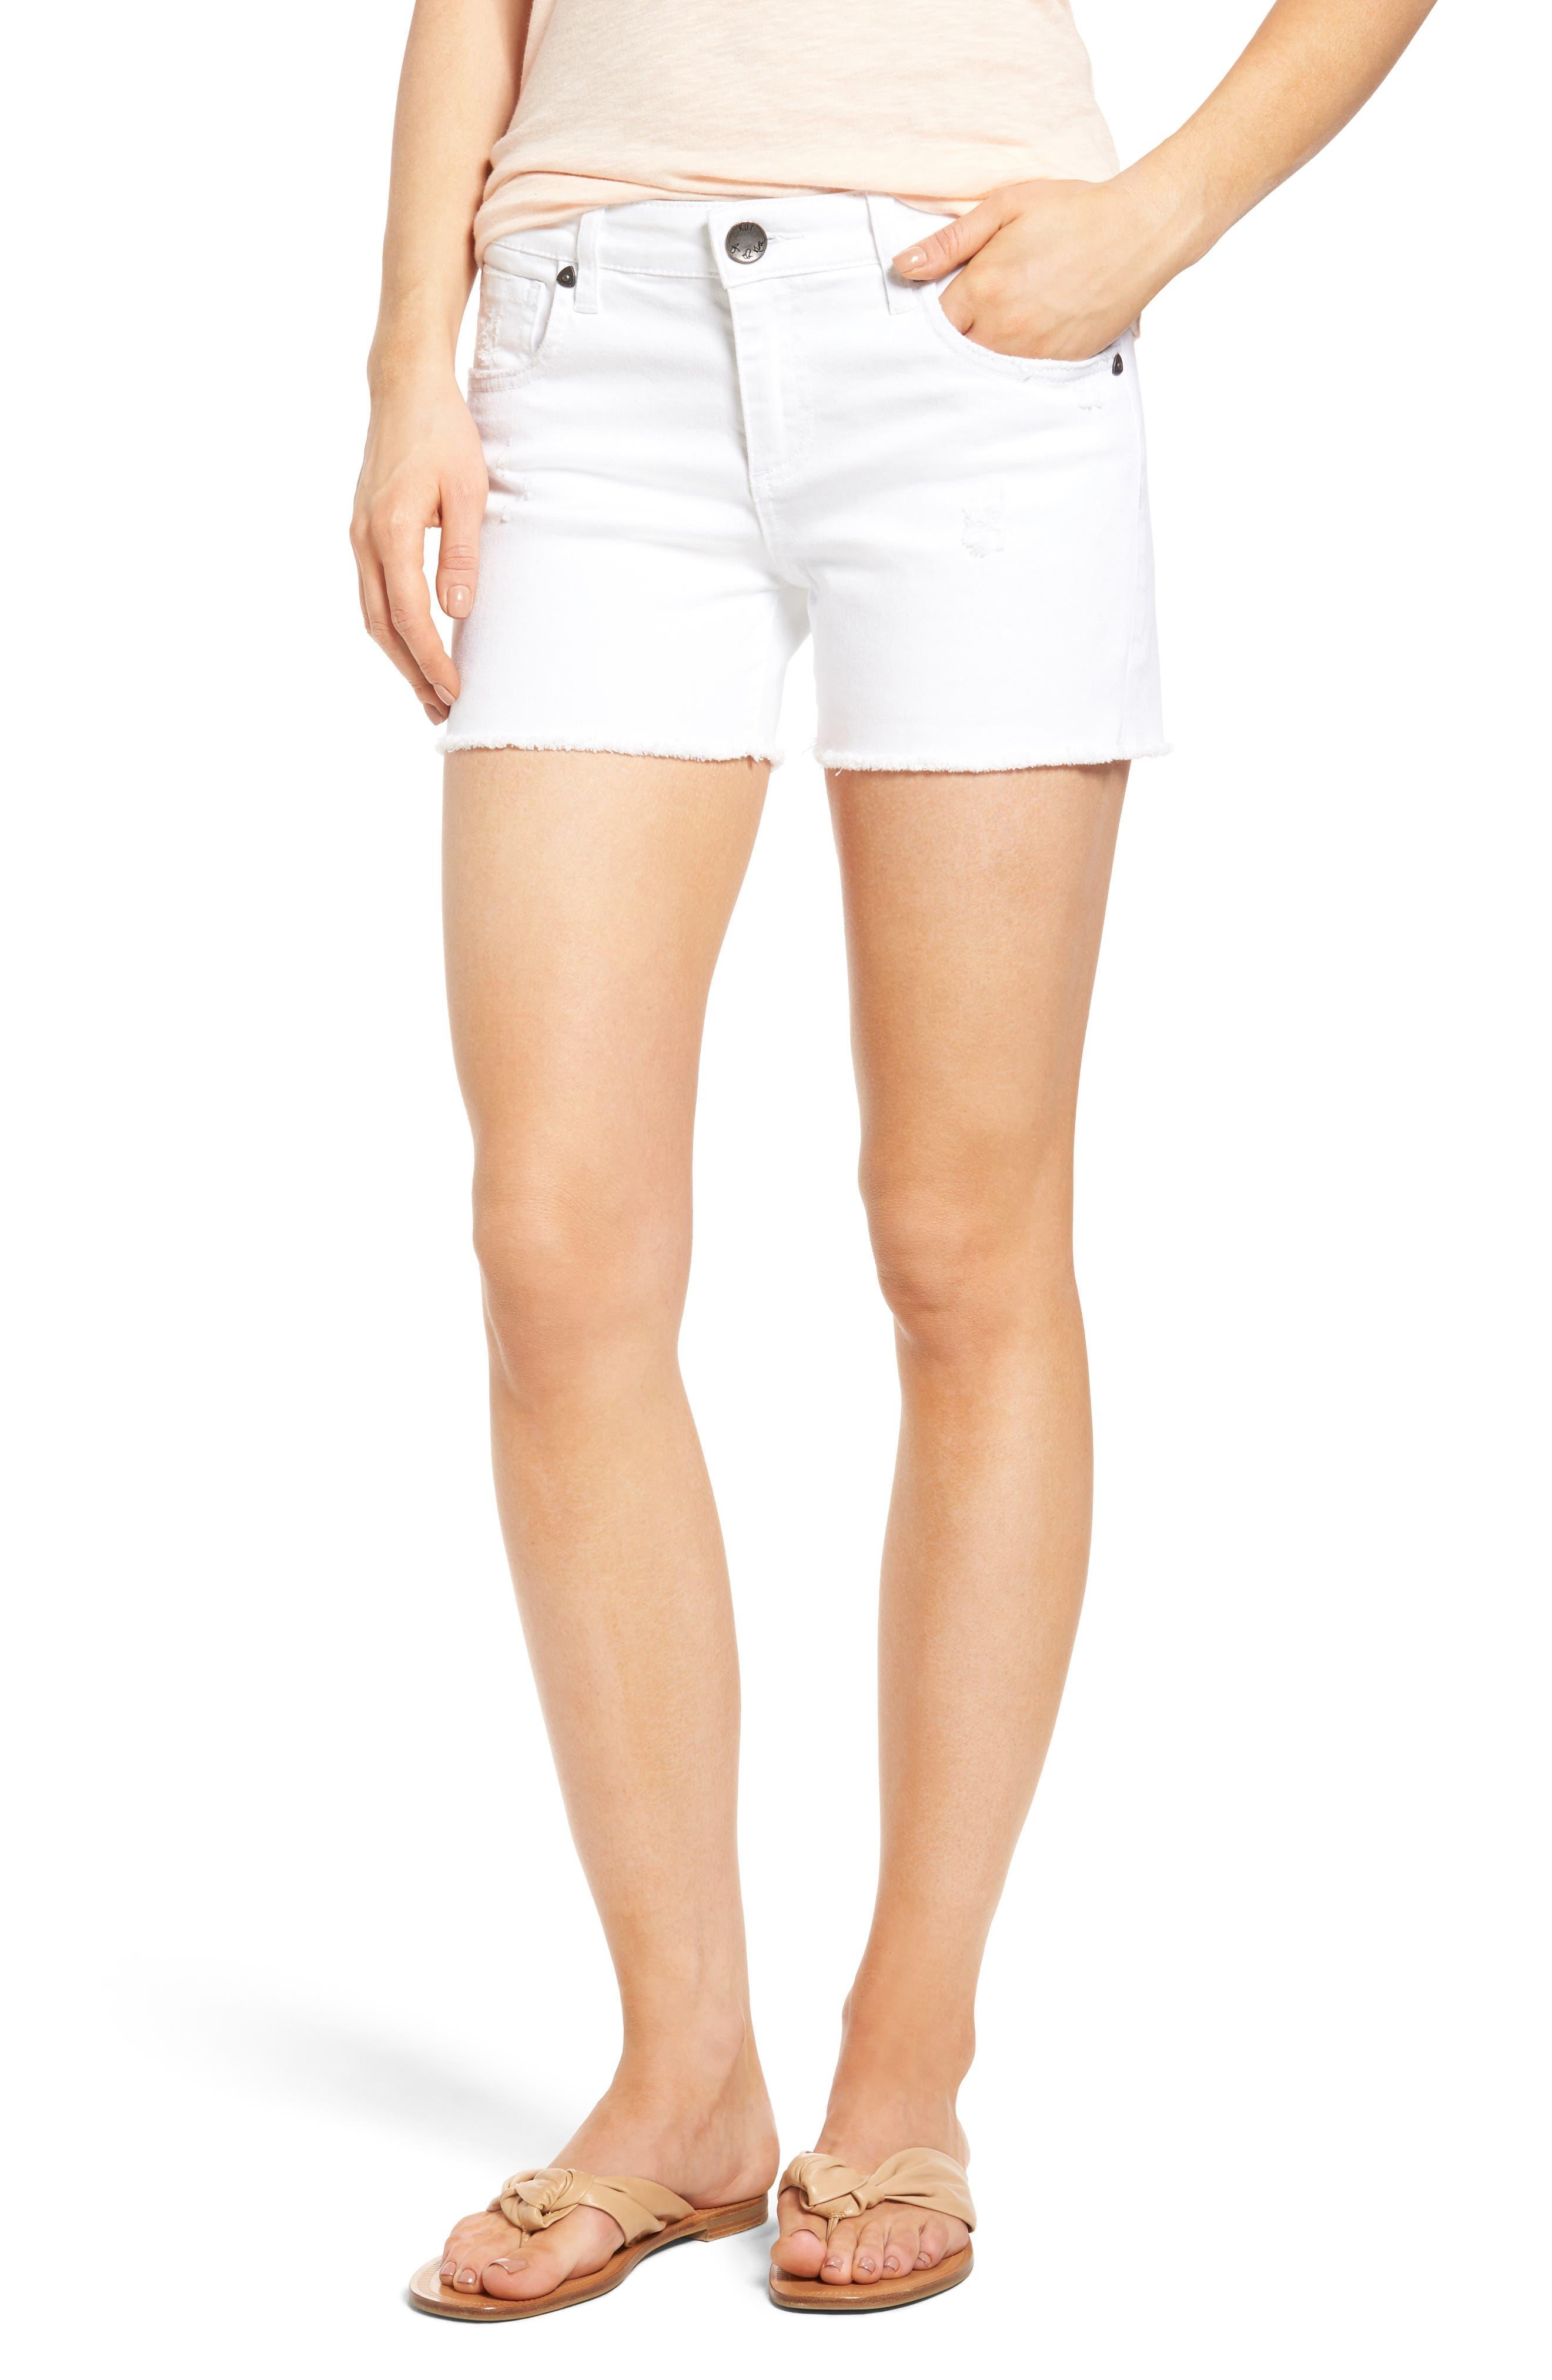 Gidget Denim Shorts,                         Main,                         color, 110